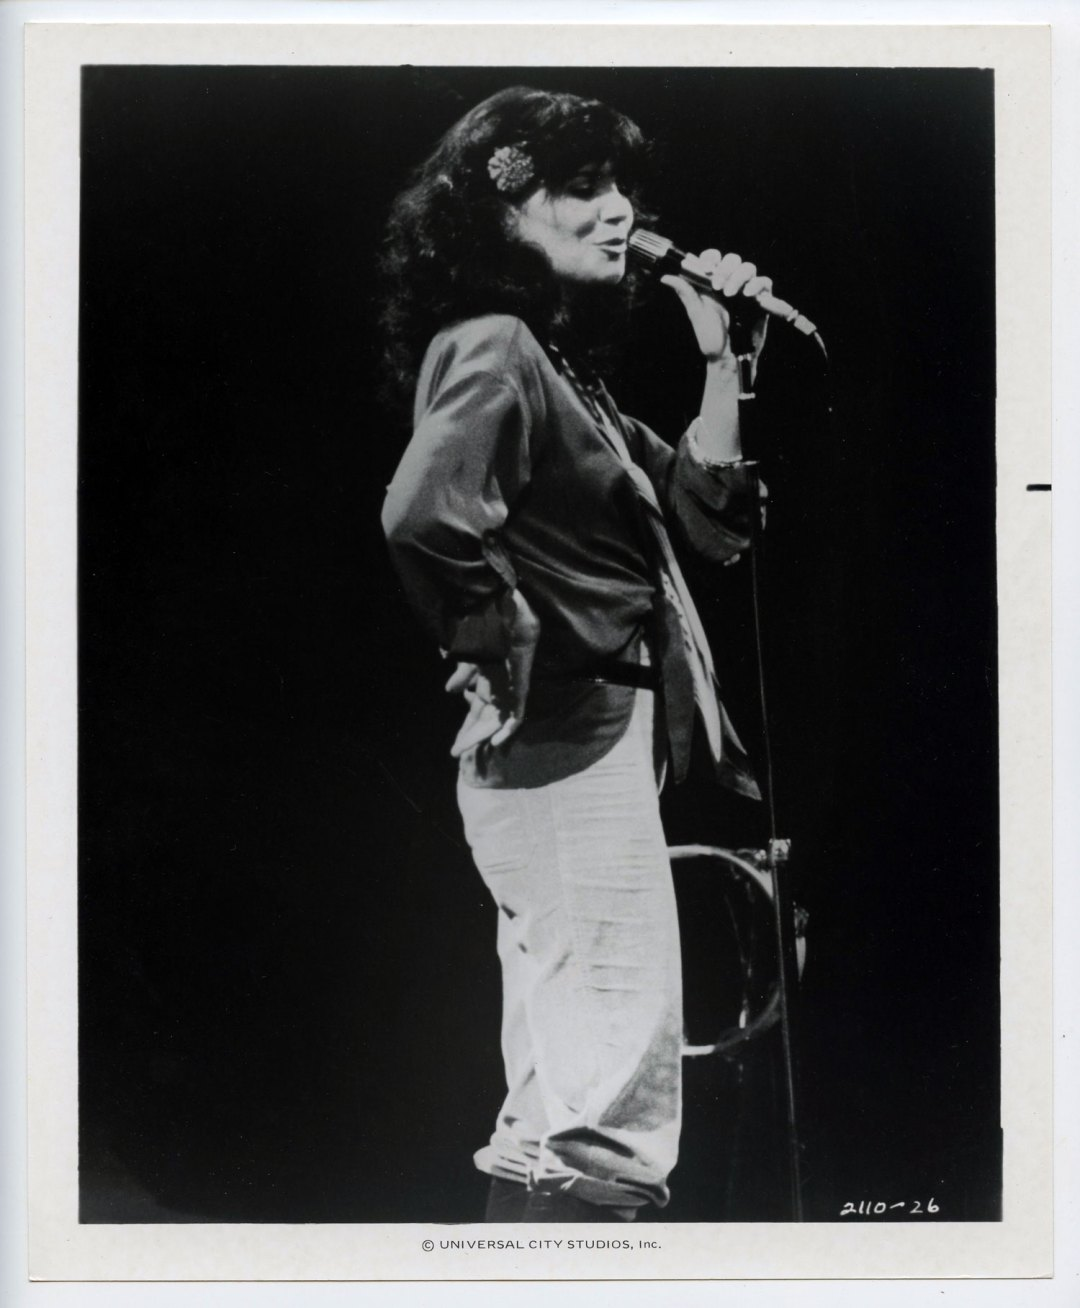 Linda Ronstadt Photo 1978 Movie FM Appearance Universal Studios Original Vintage